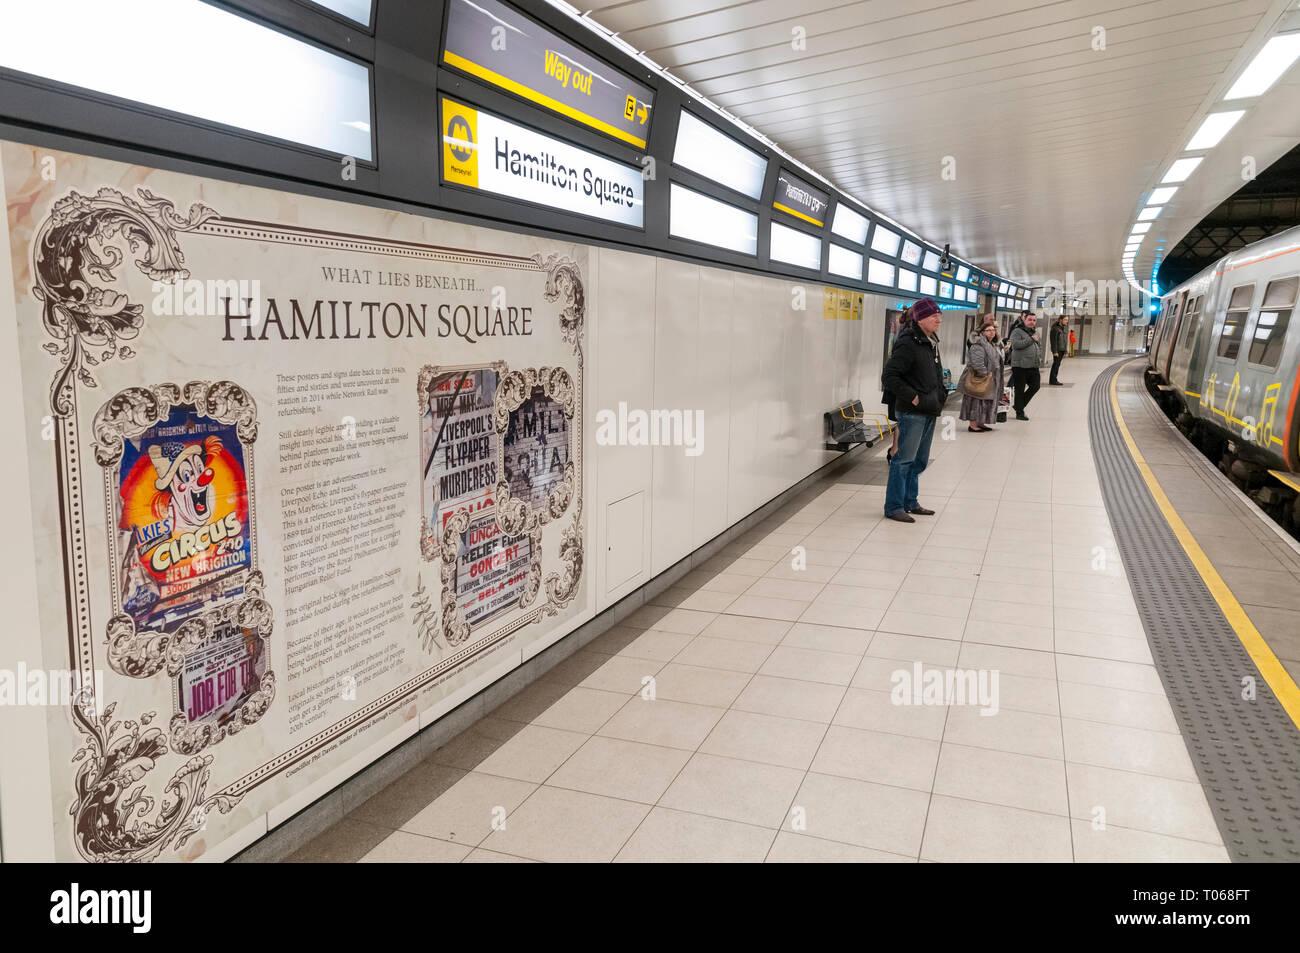 Merseyrail Hamilton Square station platform - Stock Image